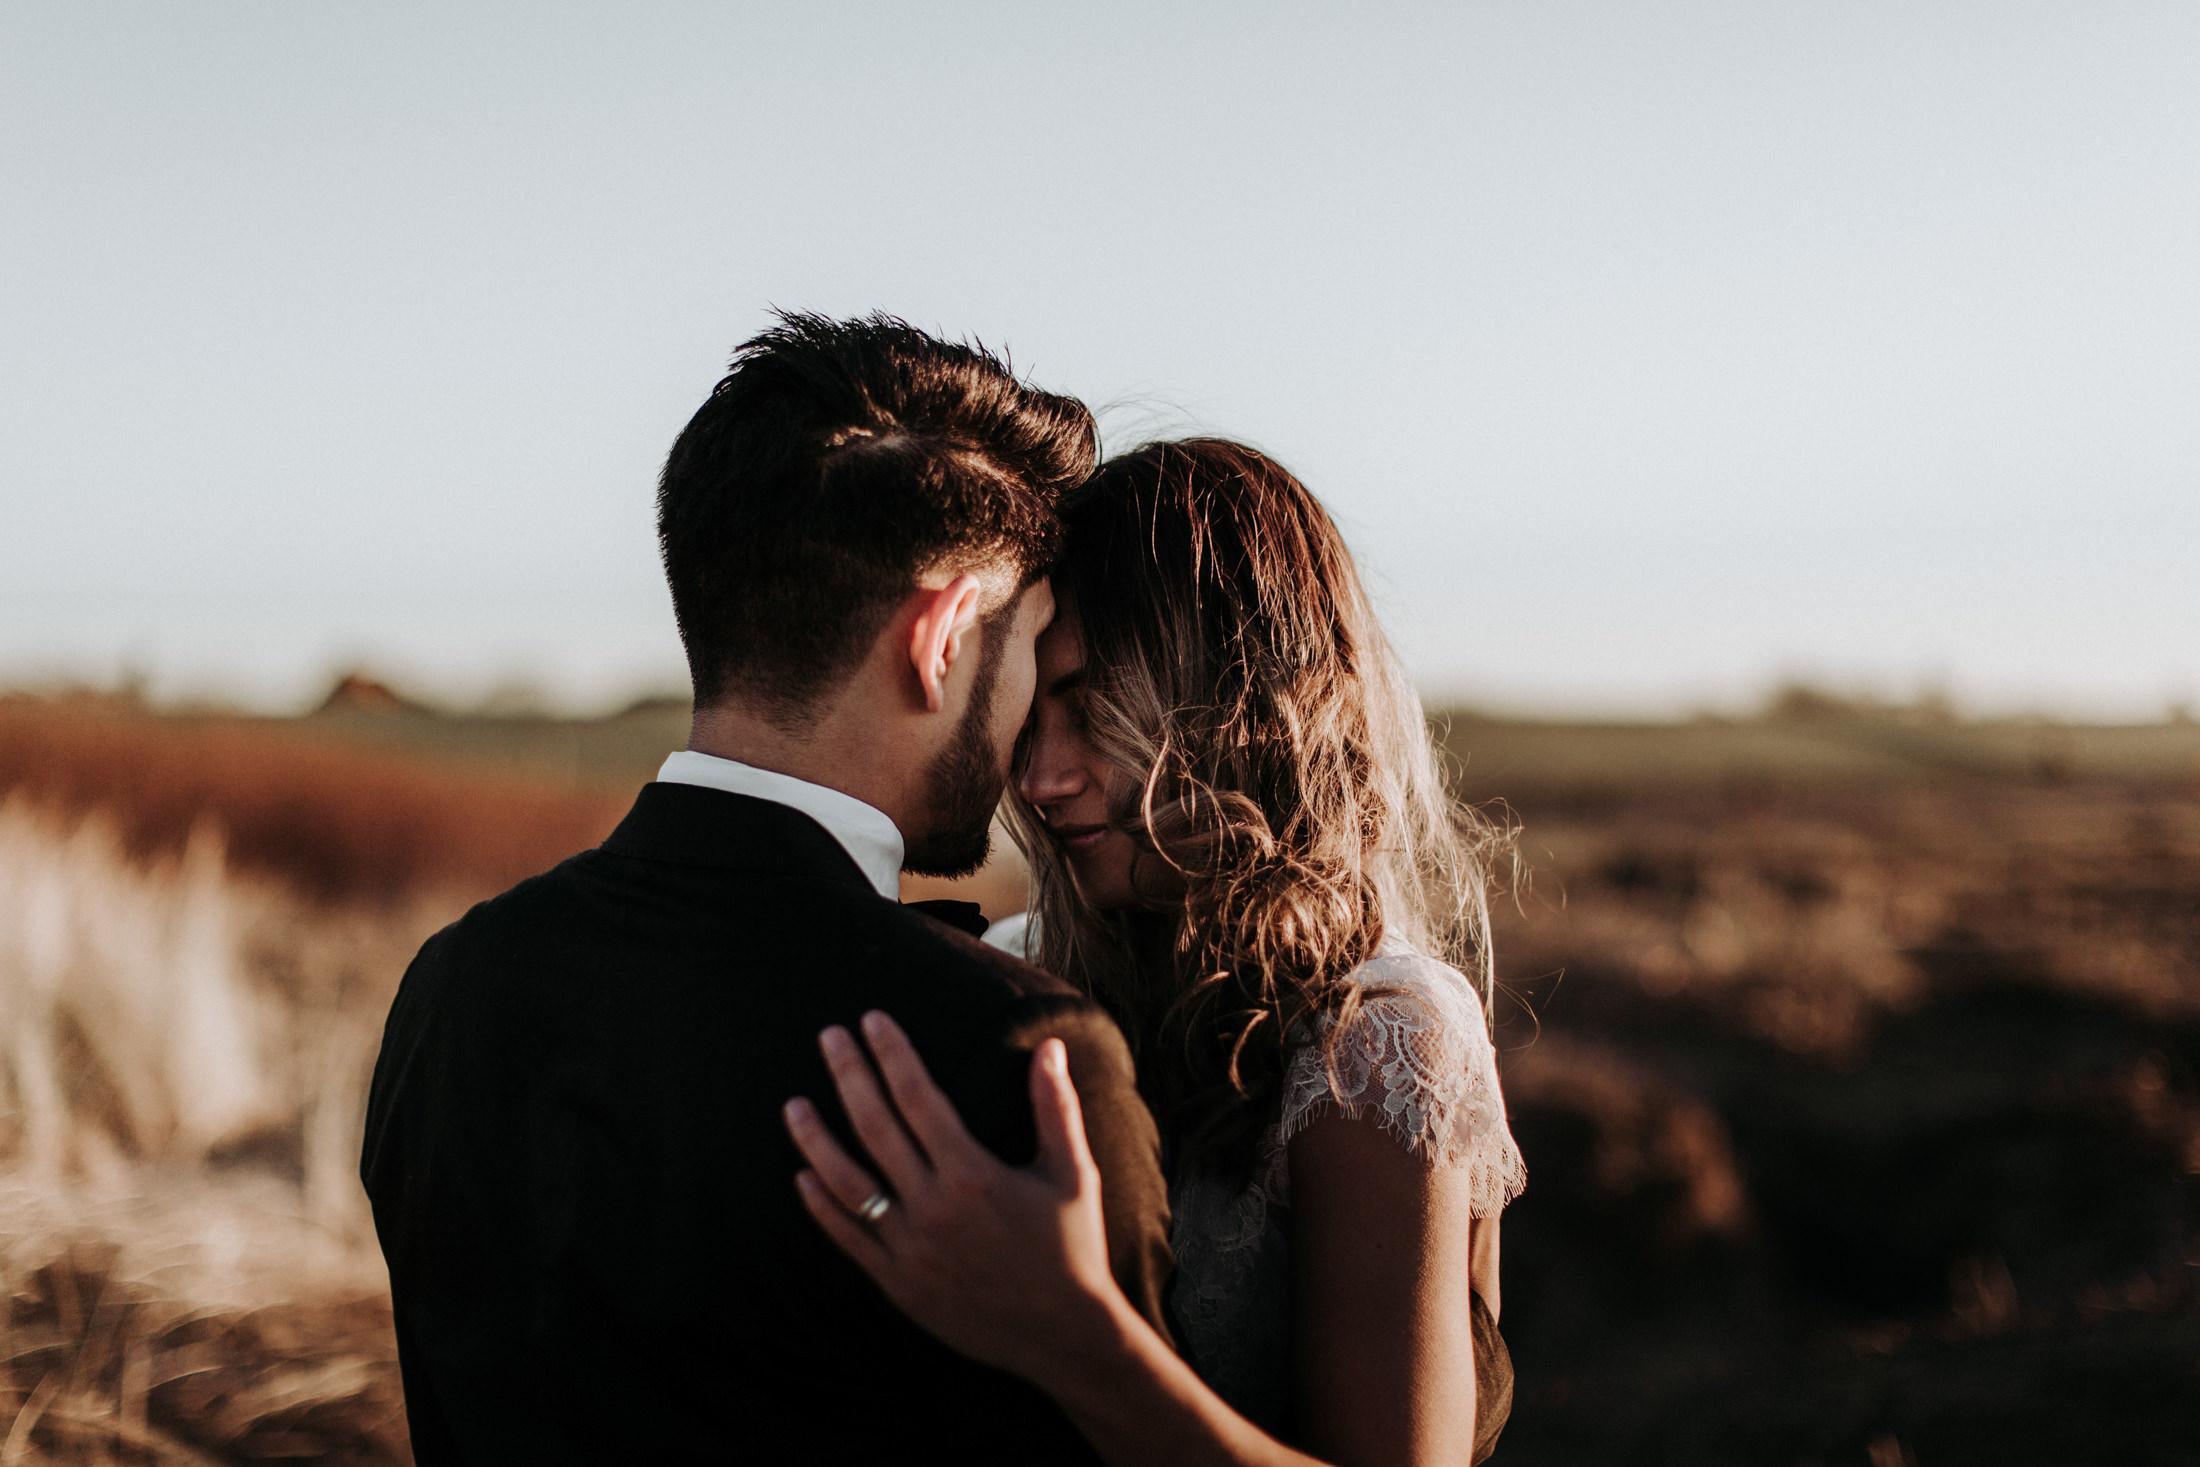 Wedding_Photographer_Mallorca_Daniela-Marquardt_Photography_CanaryIslands_Lanzarote_Iceland_Tuskany_Santorini_Portugal_Schweiz_Austria_Bayern_Elopement_Hochzeitsfotograf_Norddeichich_41